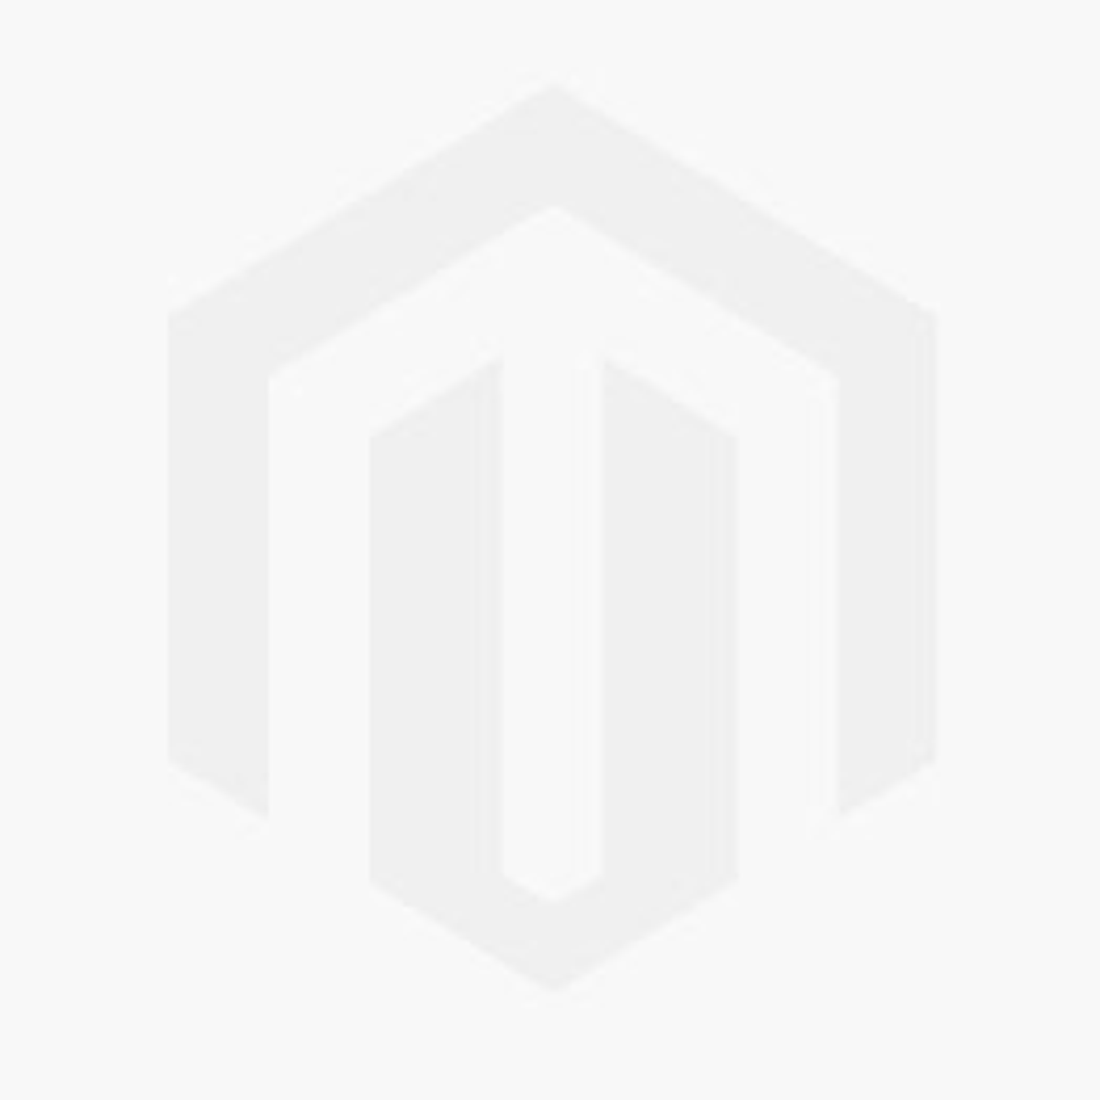 Albert Irvin OBE RA Untitled opus w.3 (framed)